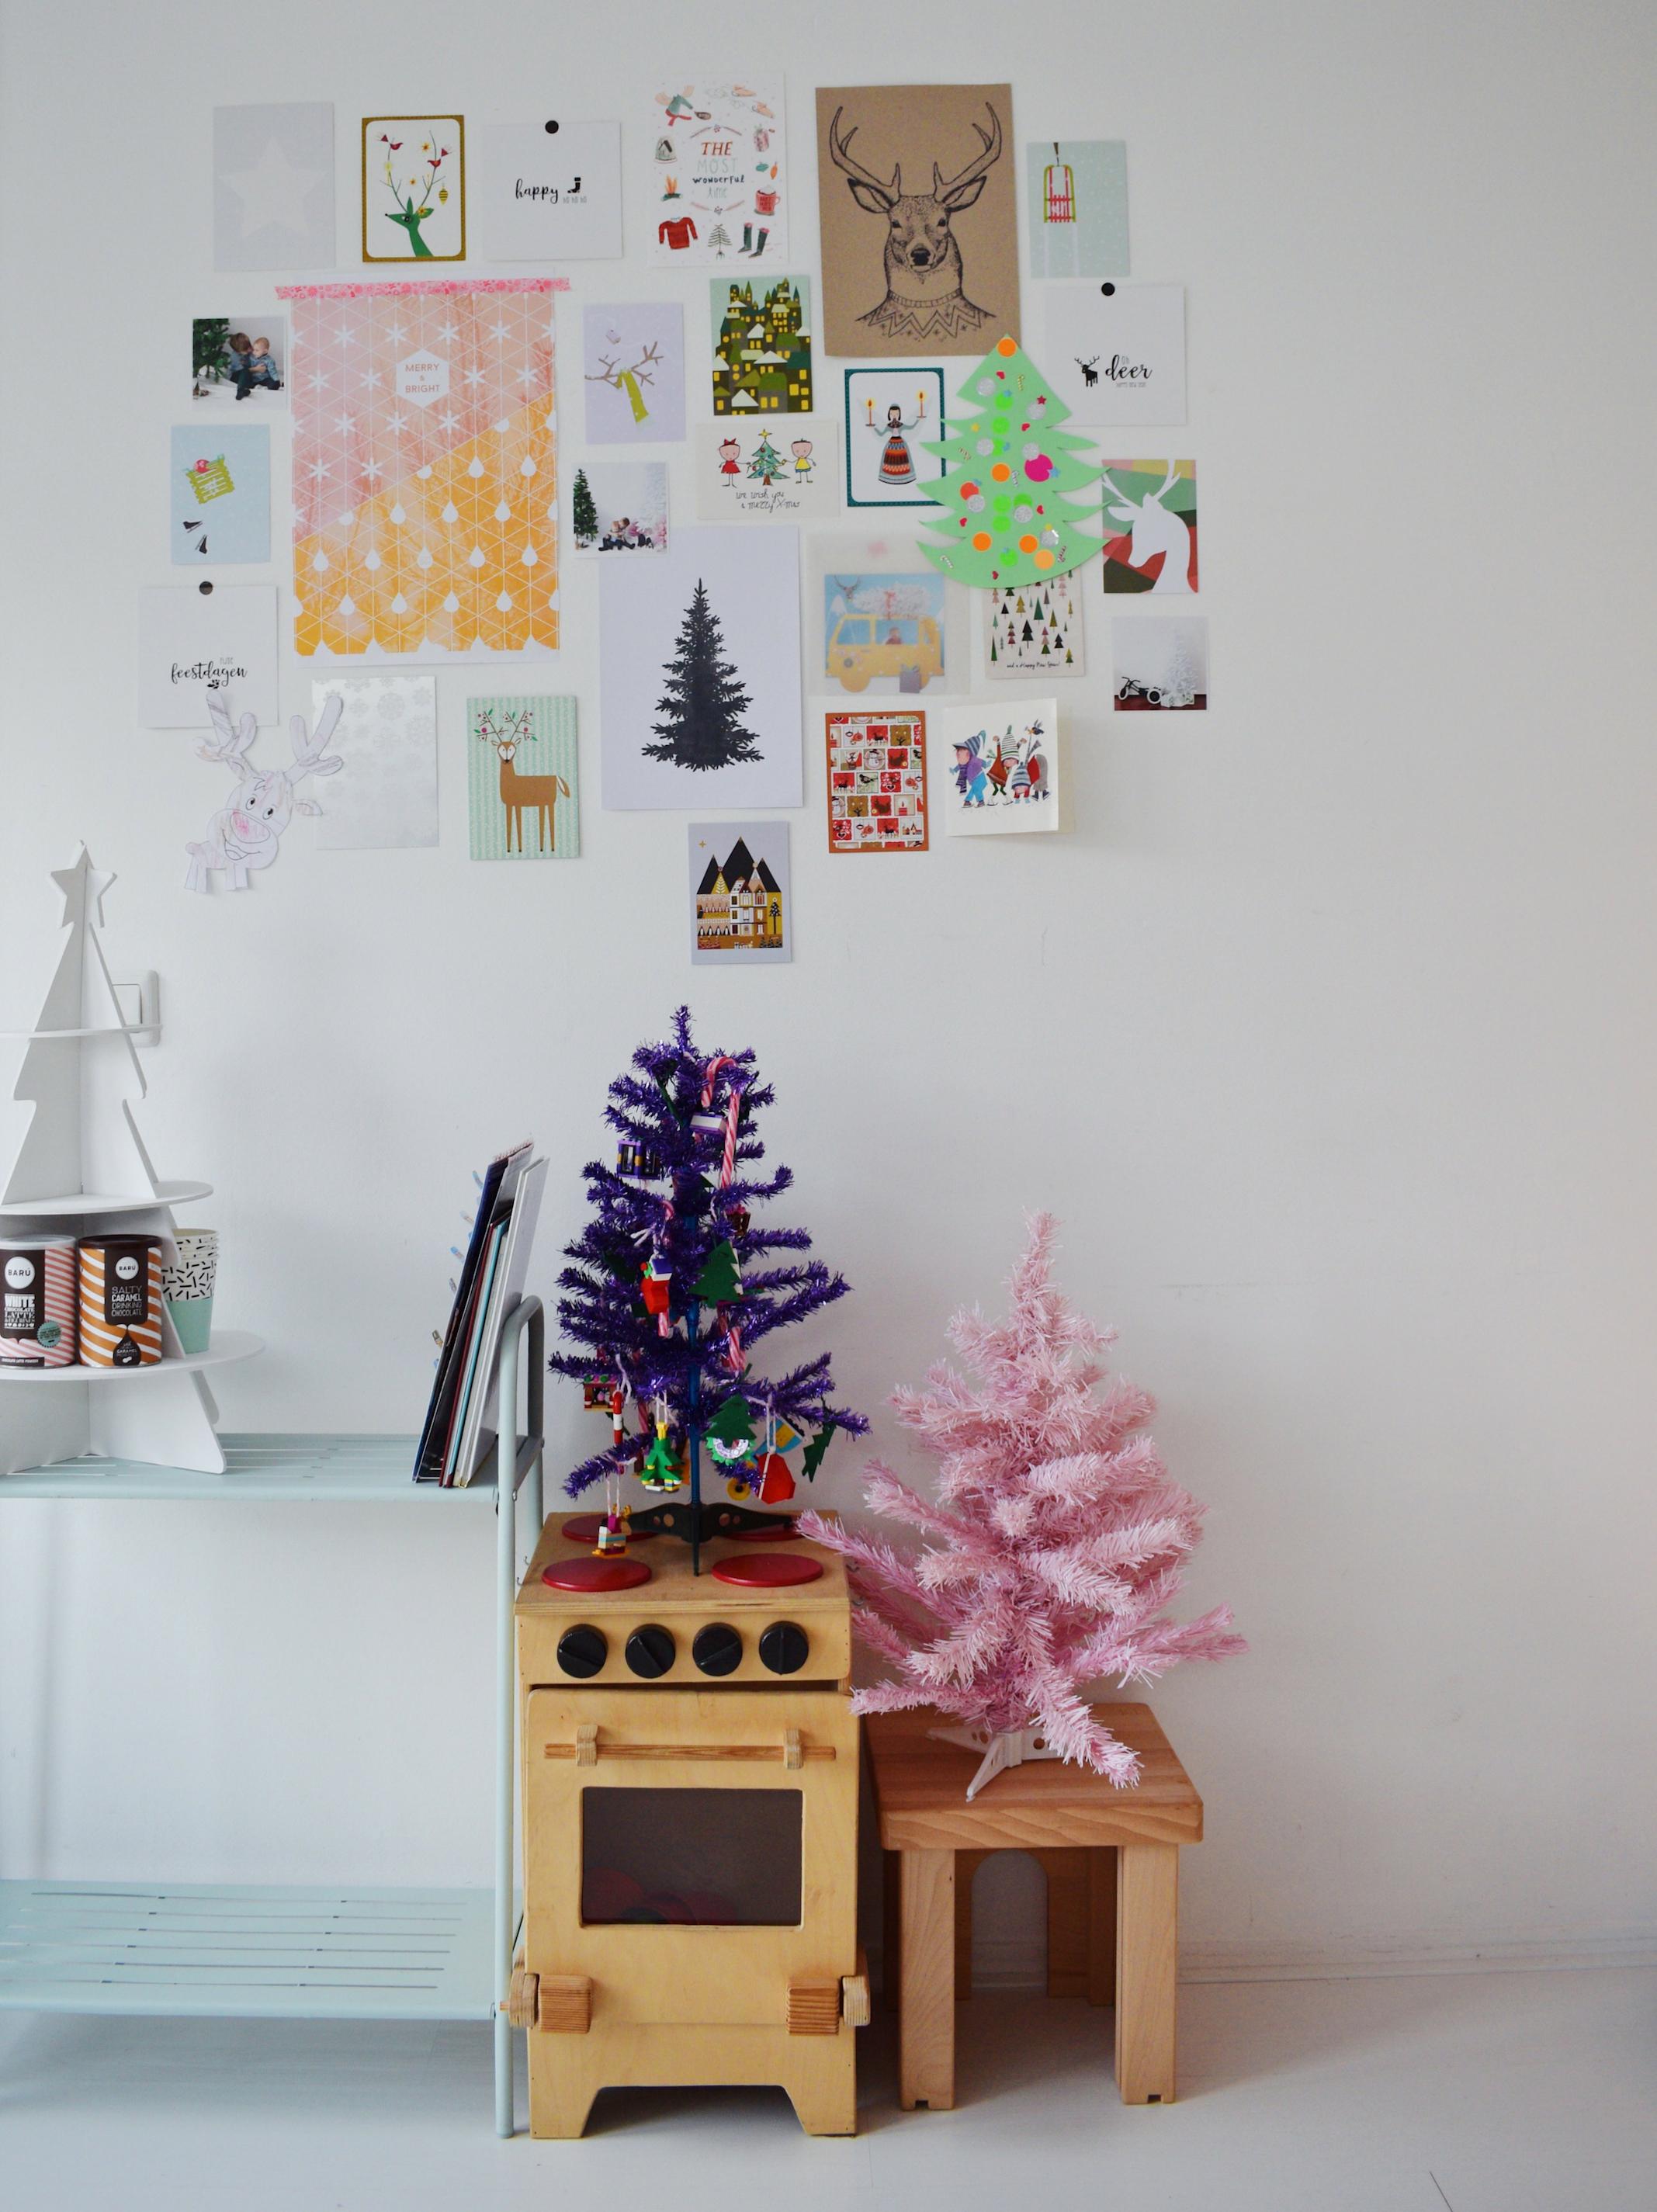 kersthuis 2018 kerst wanddecoratie woonkamer